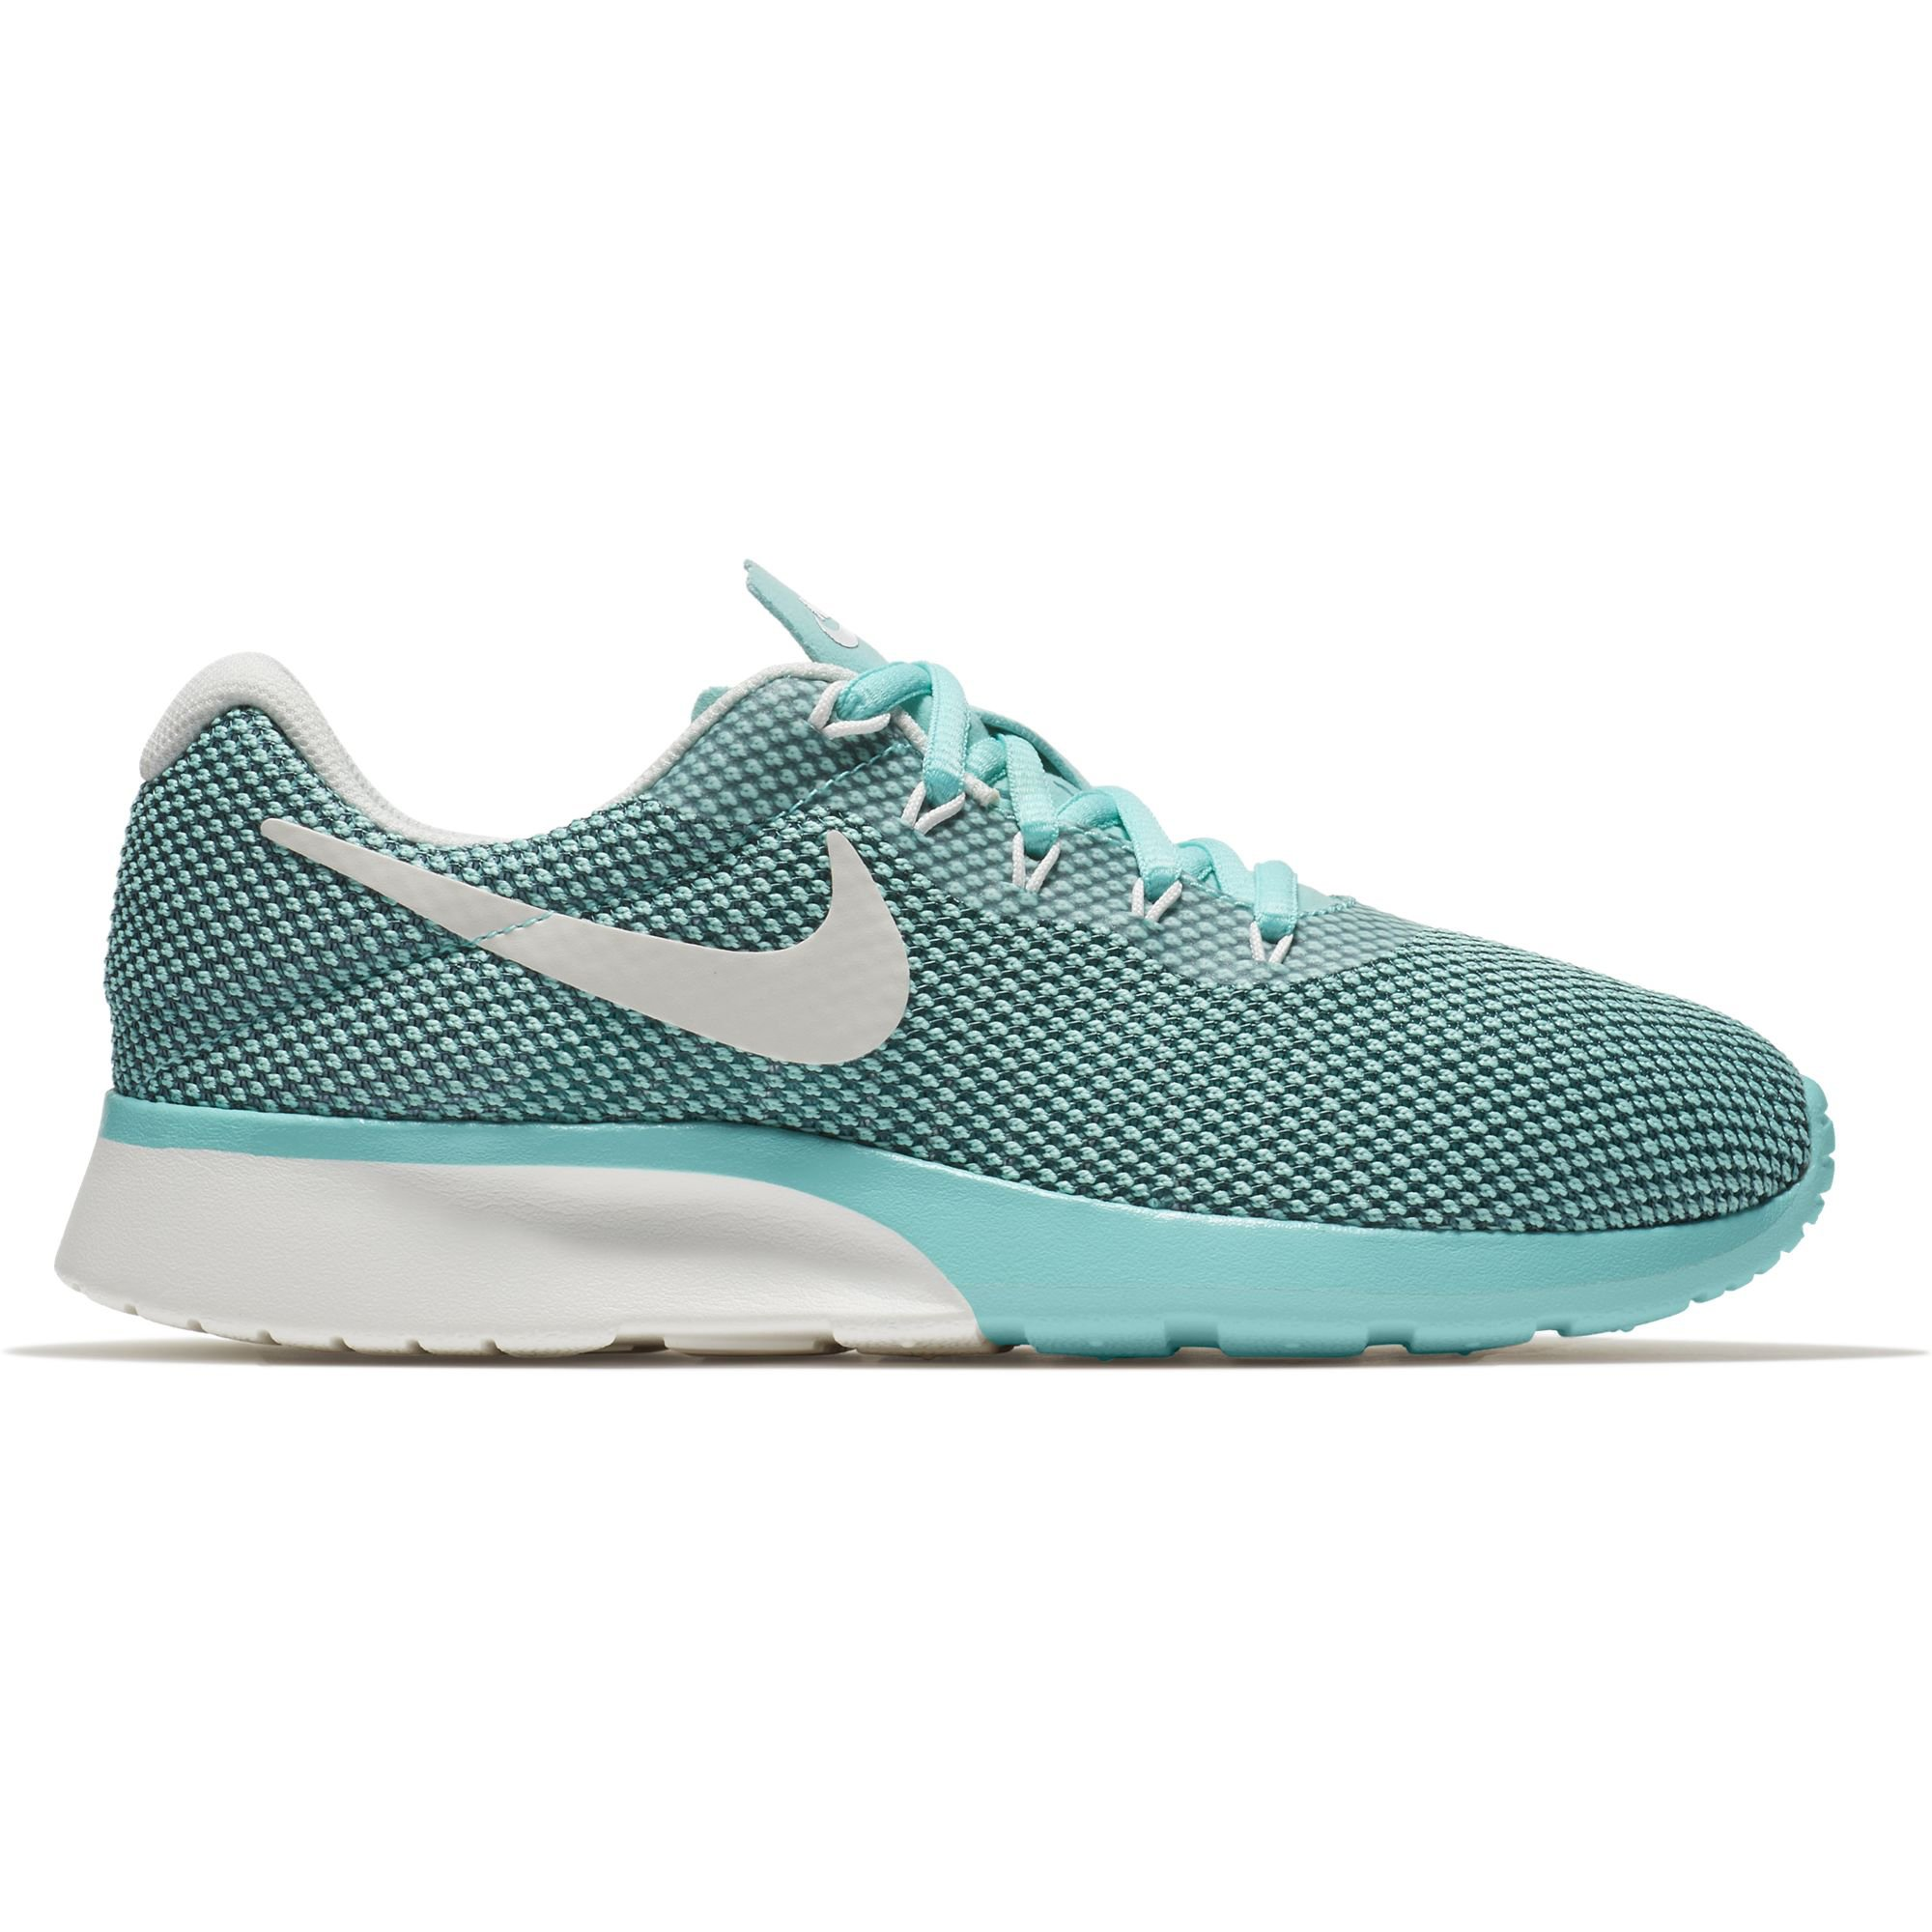 best service 8b593 270f4 ... shopping nike 921668 300 womens tanjun racer running shoe aurora green  walmart 9accd f01d9